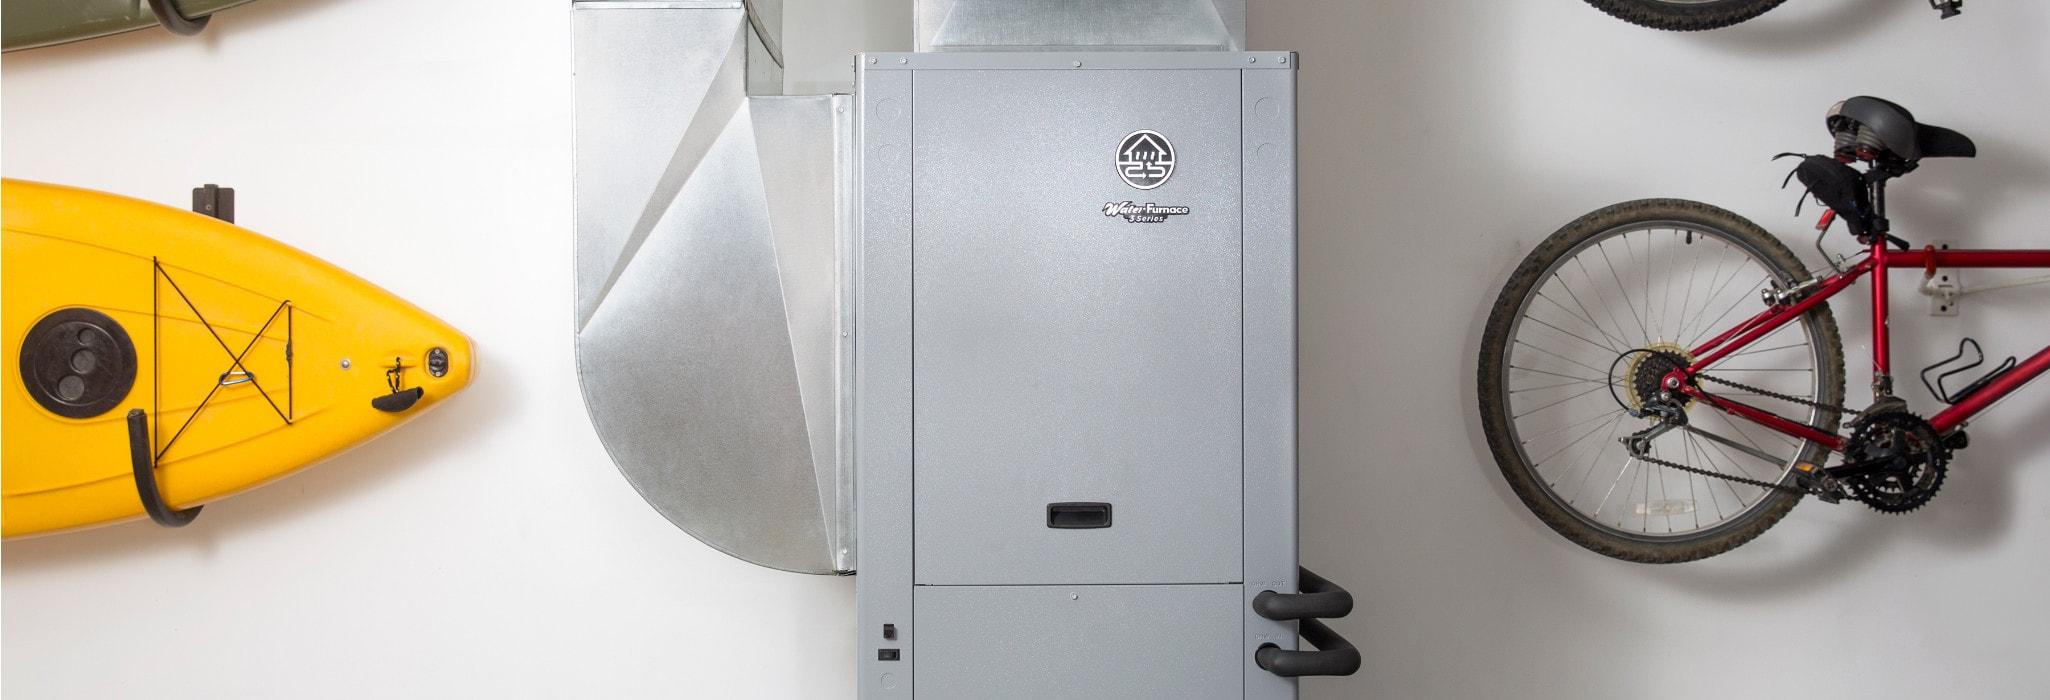 WaterFurnace 300 Series Installation